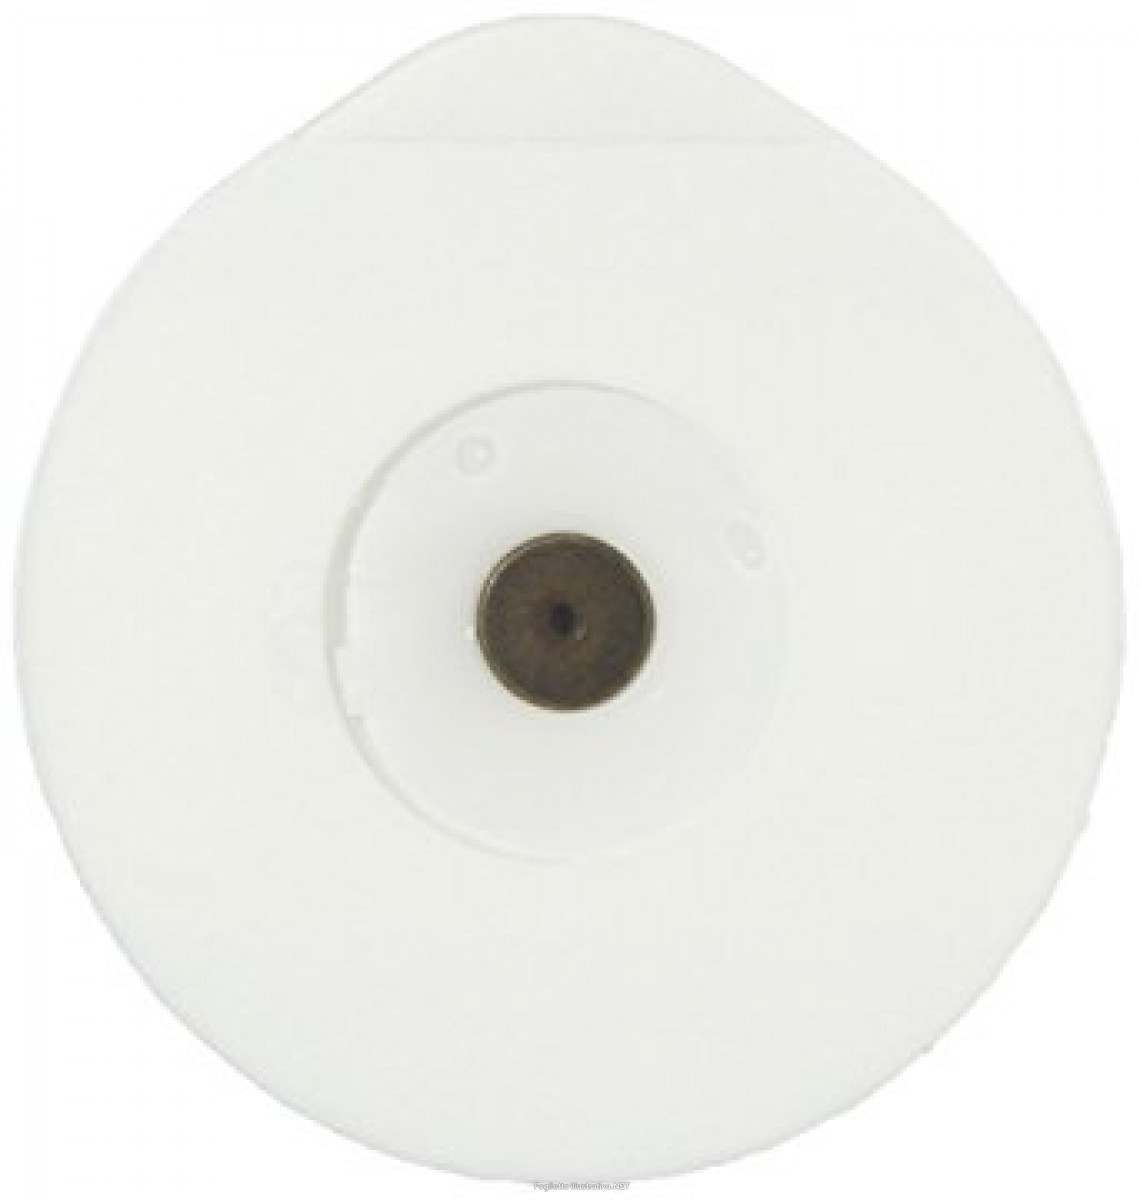 Elettrodo per ECG Monouso Ovale 48 X 50mm 50 Pezzi - Arcafarma.it